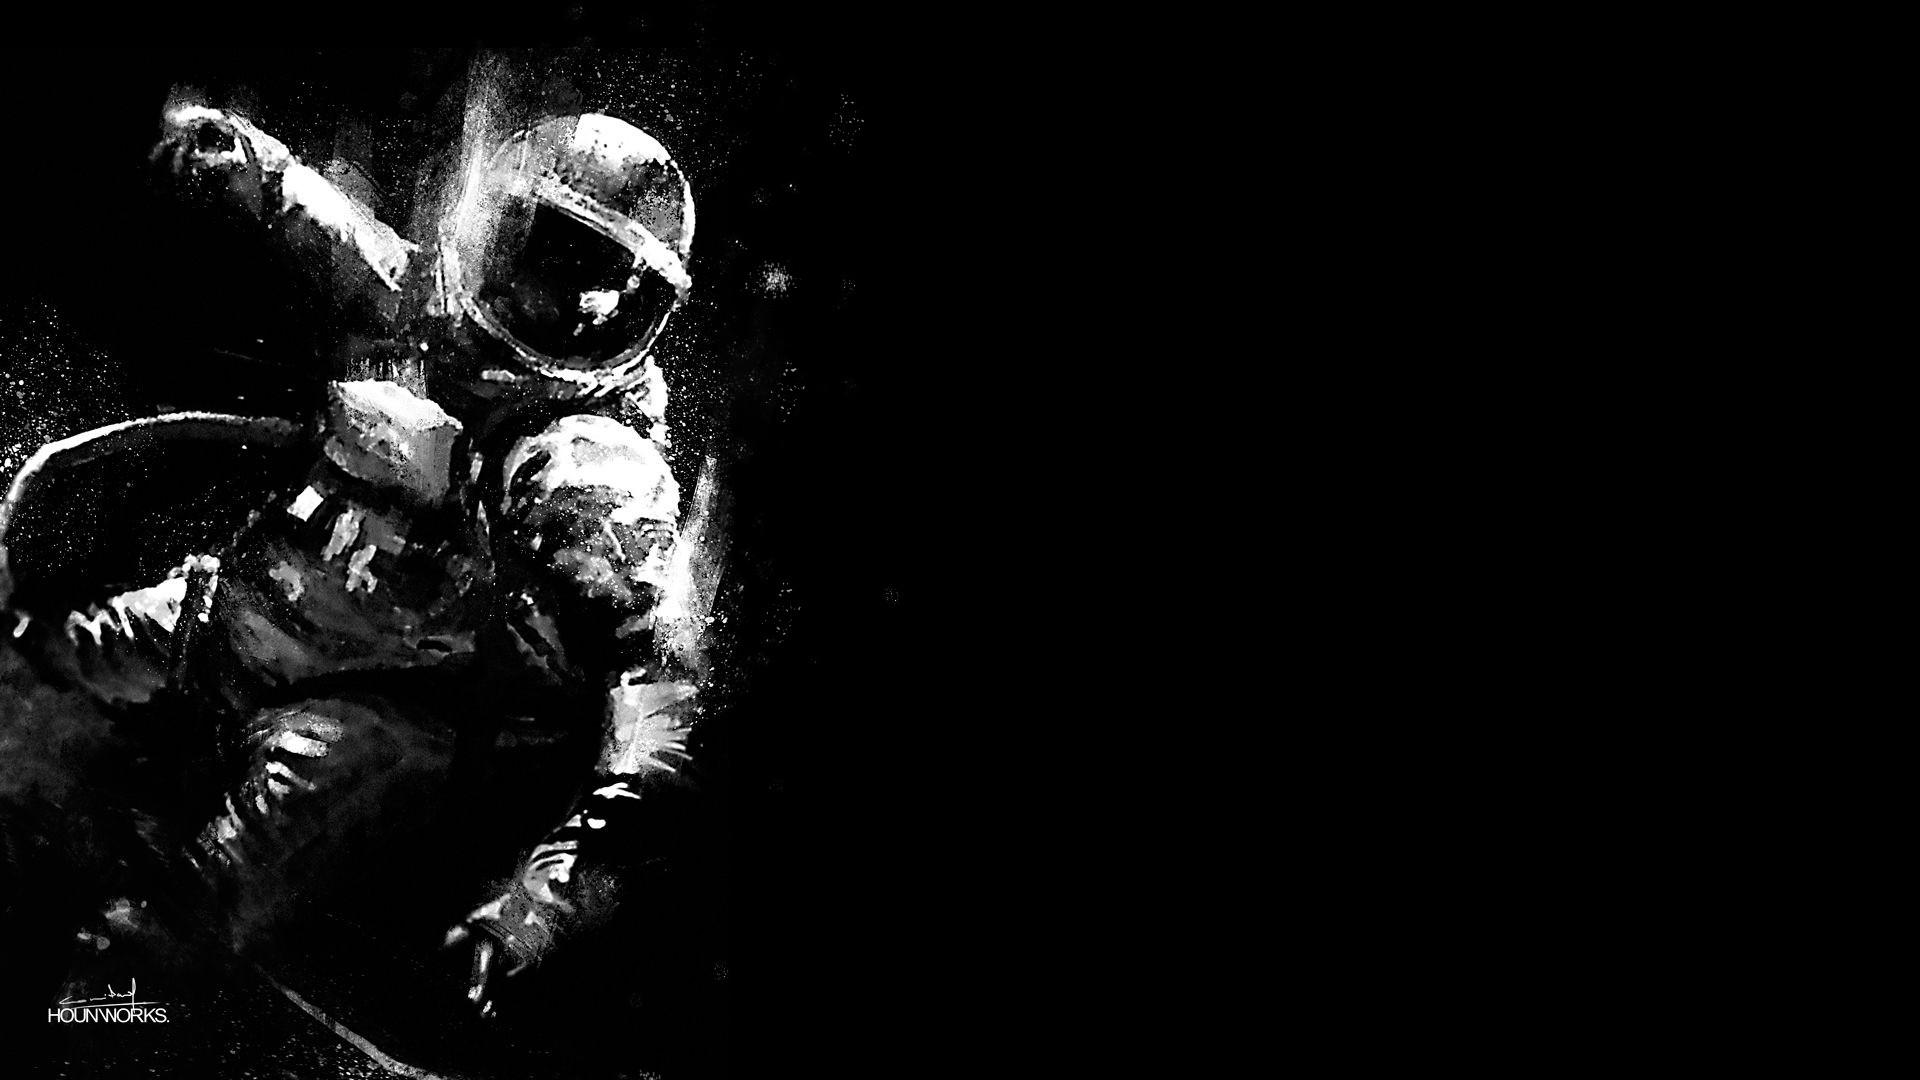 Astronaut [1920x1080] iimgurcom 1920x1080